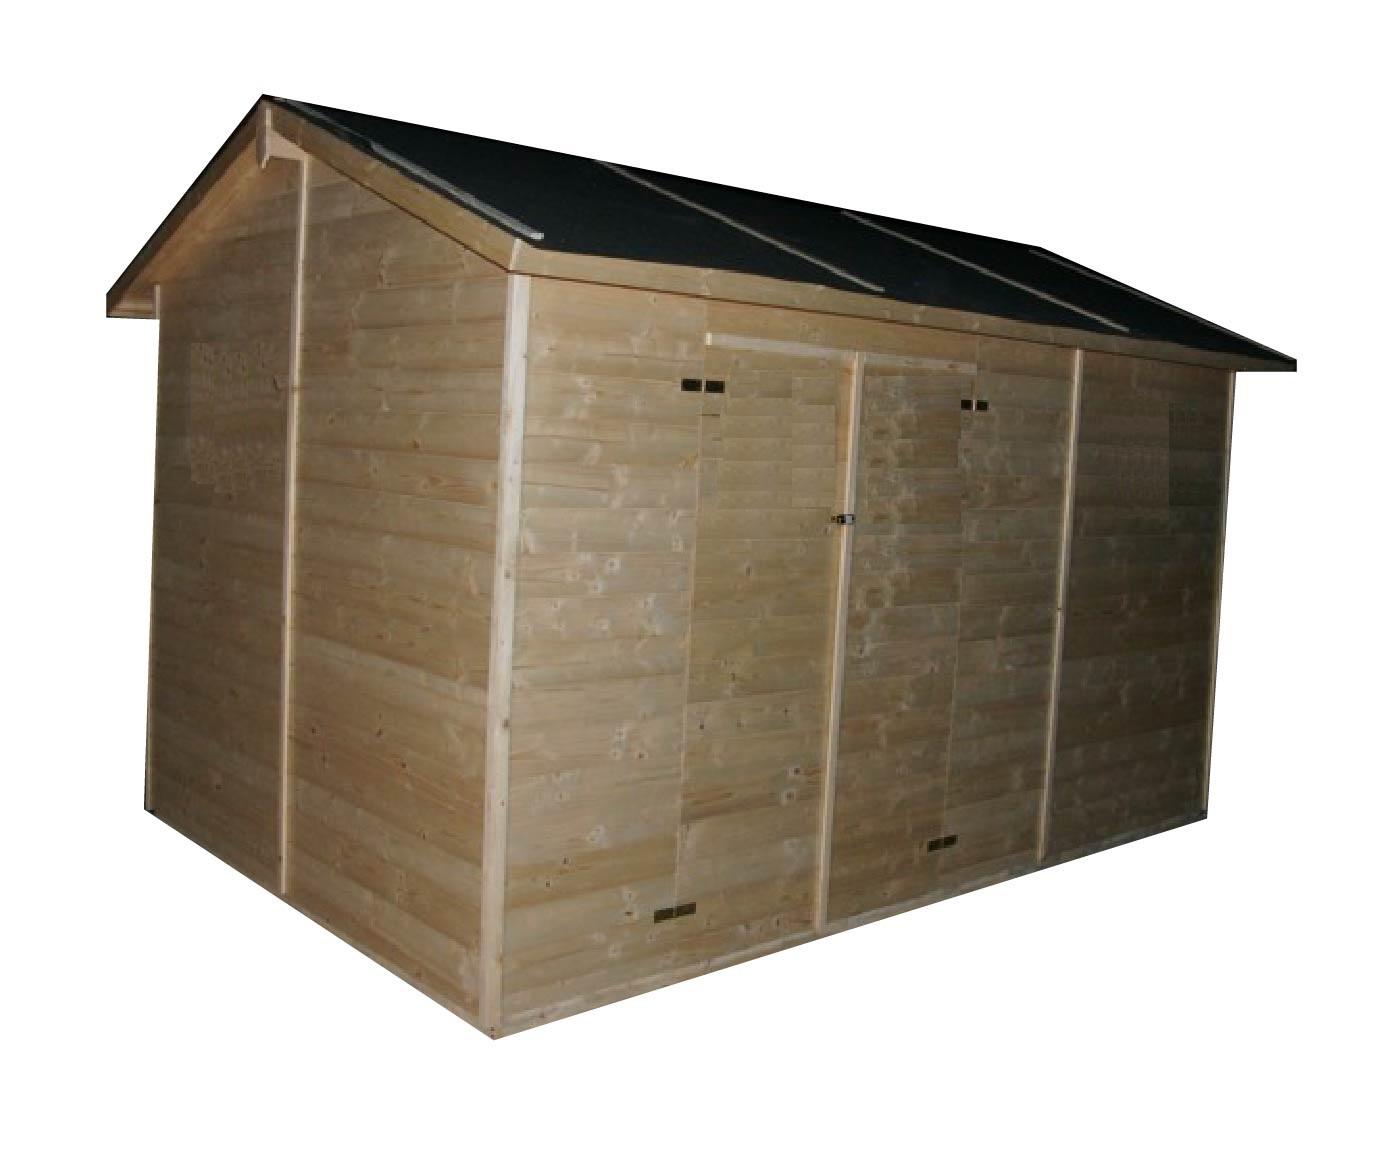 gartenh user bis 12 m2 gartenhaus aus holz 2 7m x 3 9m 16mm betera ger tehaus cadema. Black Bedroom Furniture Sets. Home Design Ideas